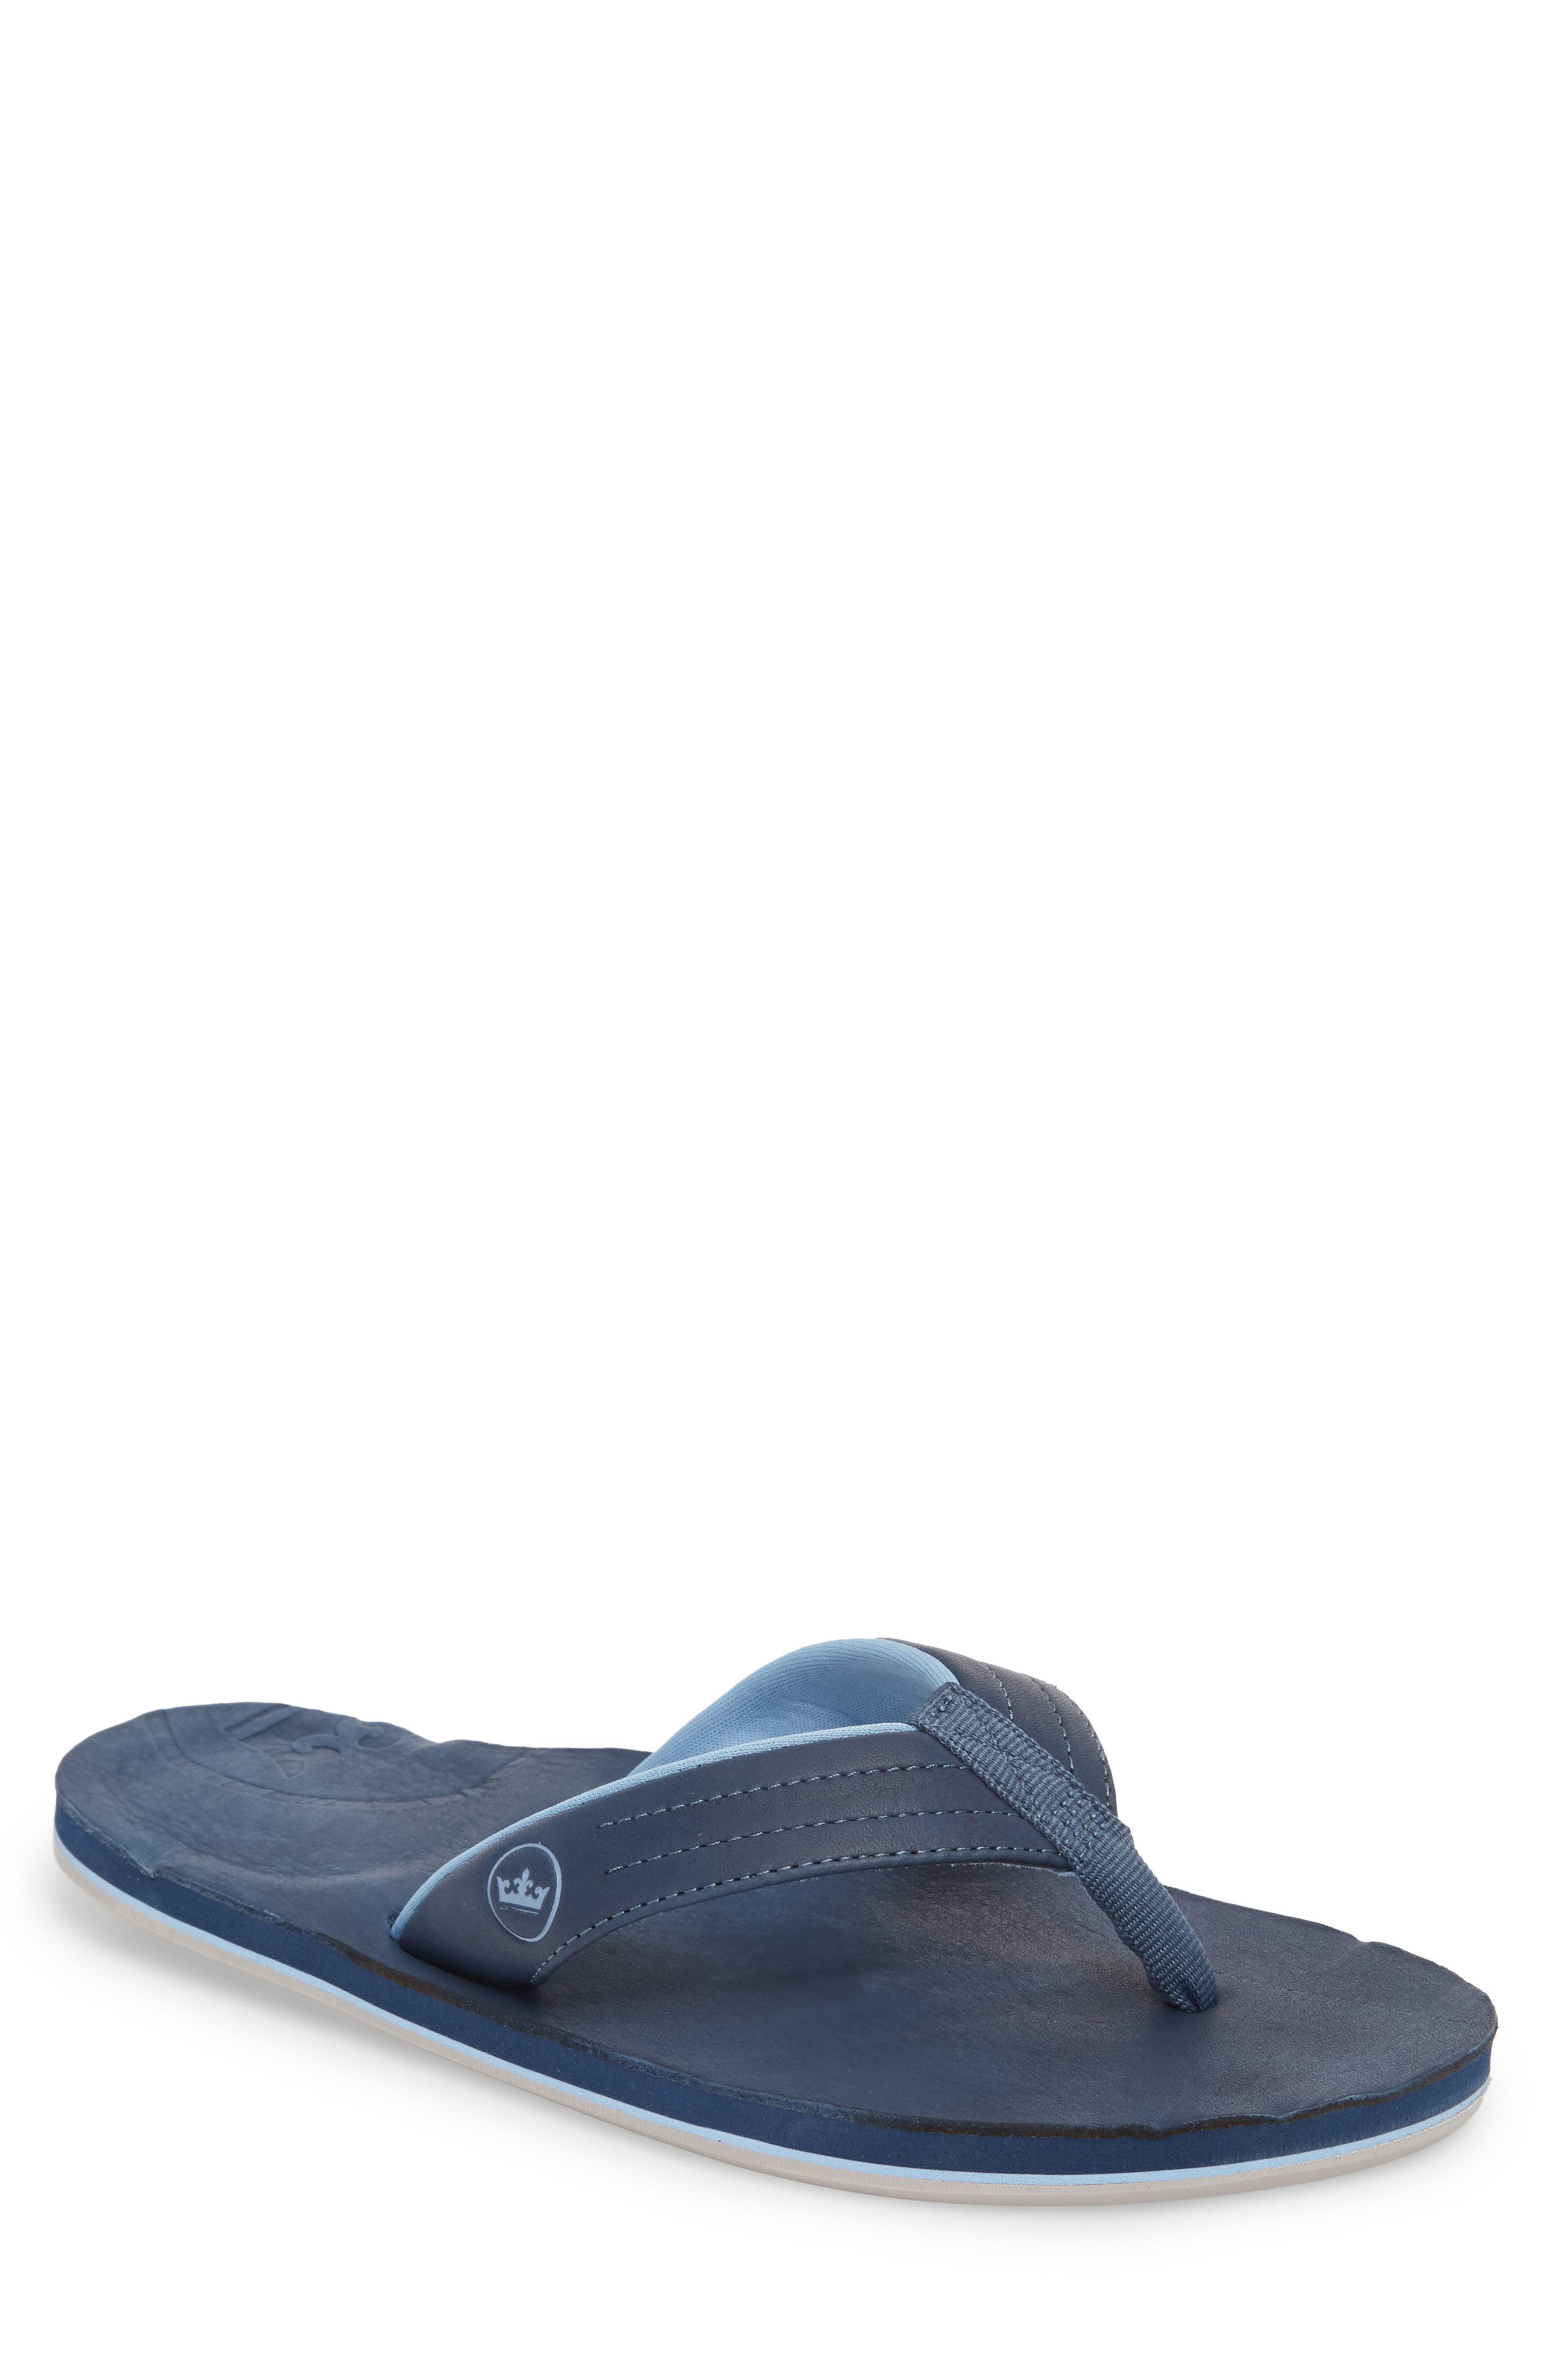 hari mari x Peter Millar Leather Flip Flop (Men)